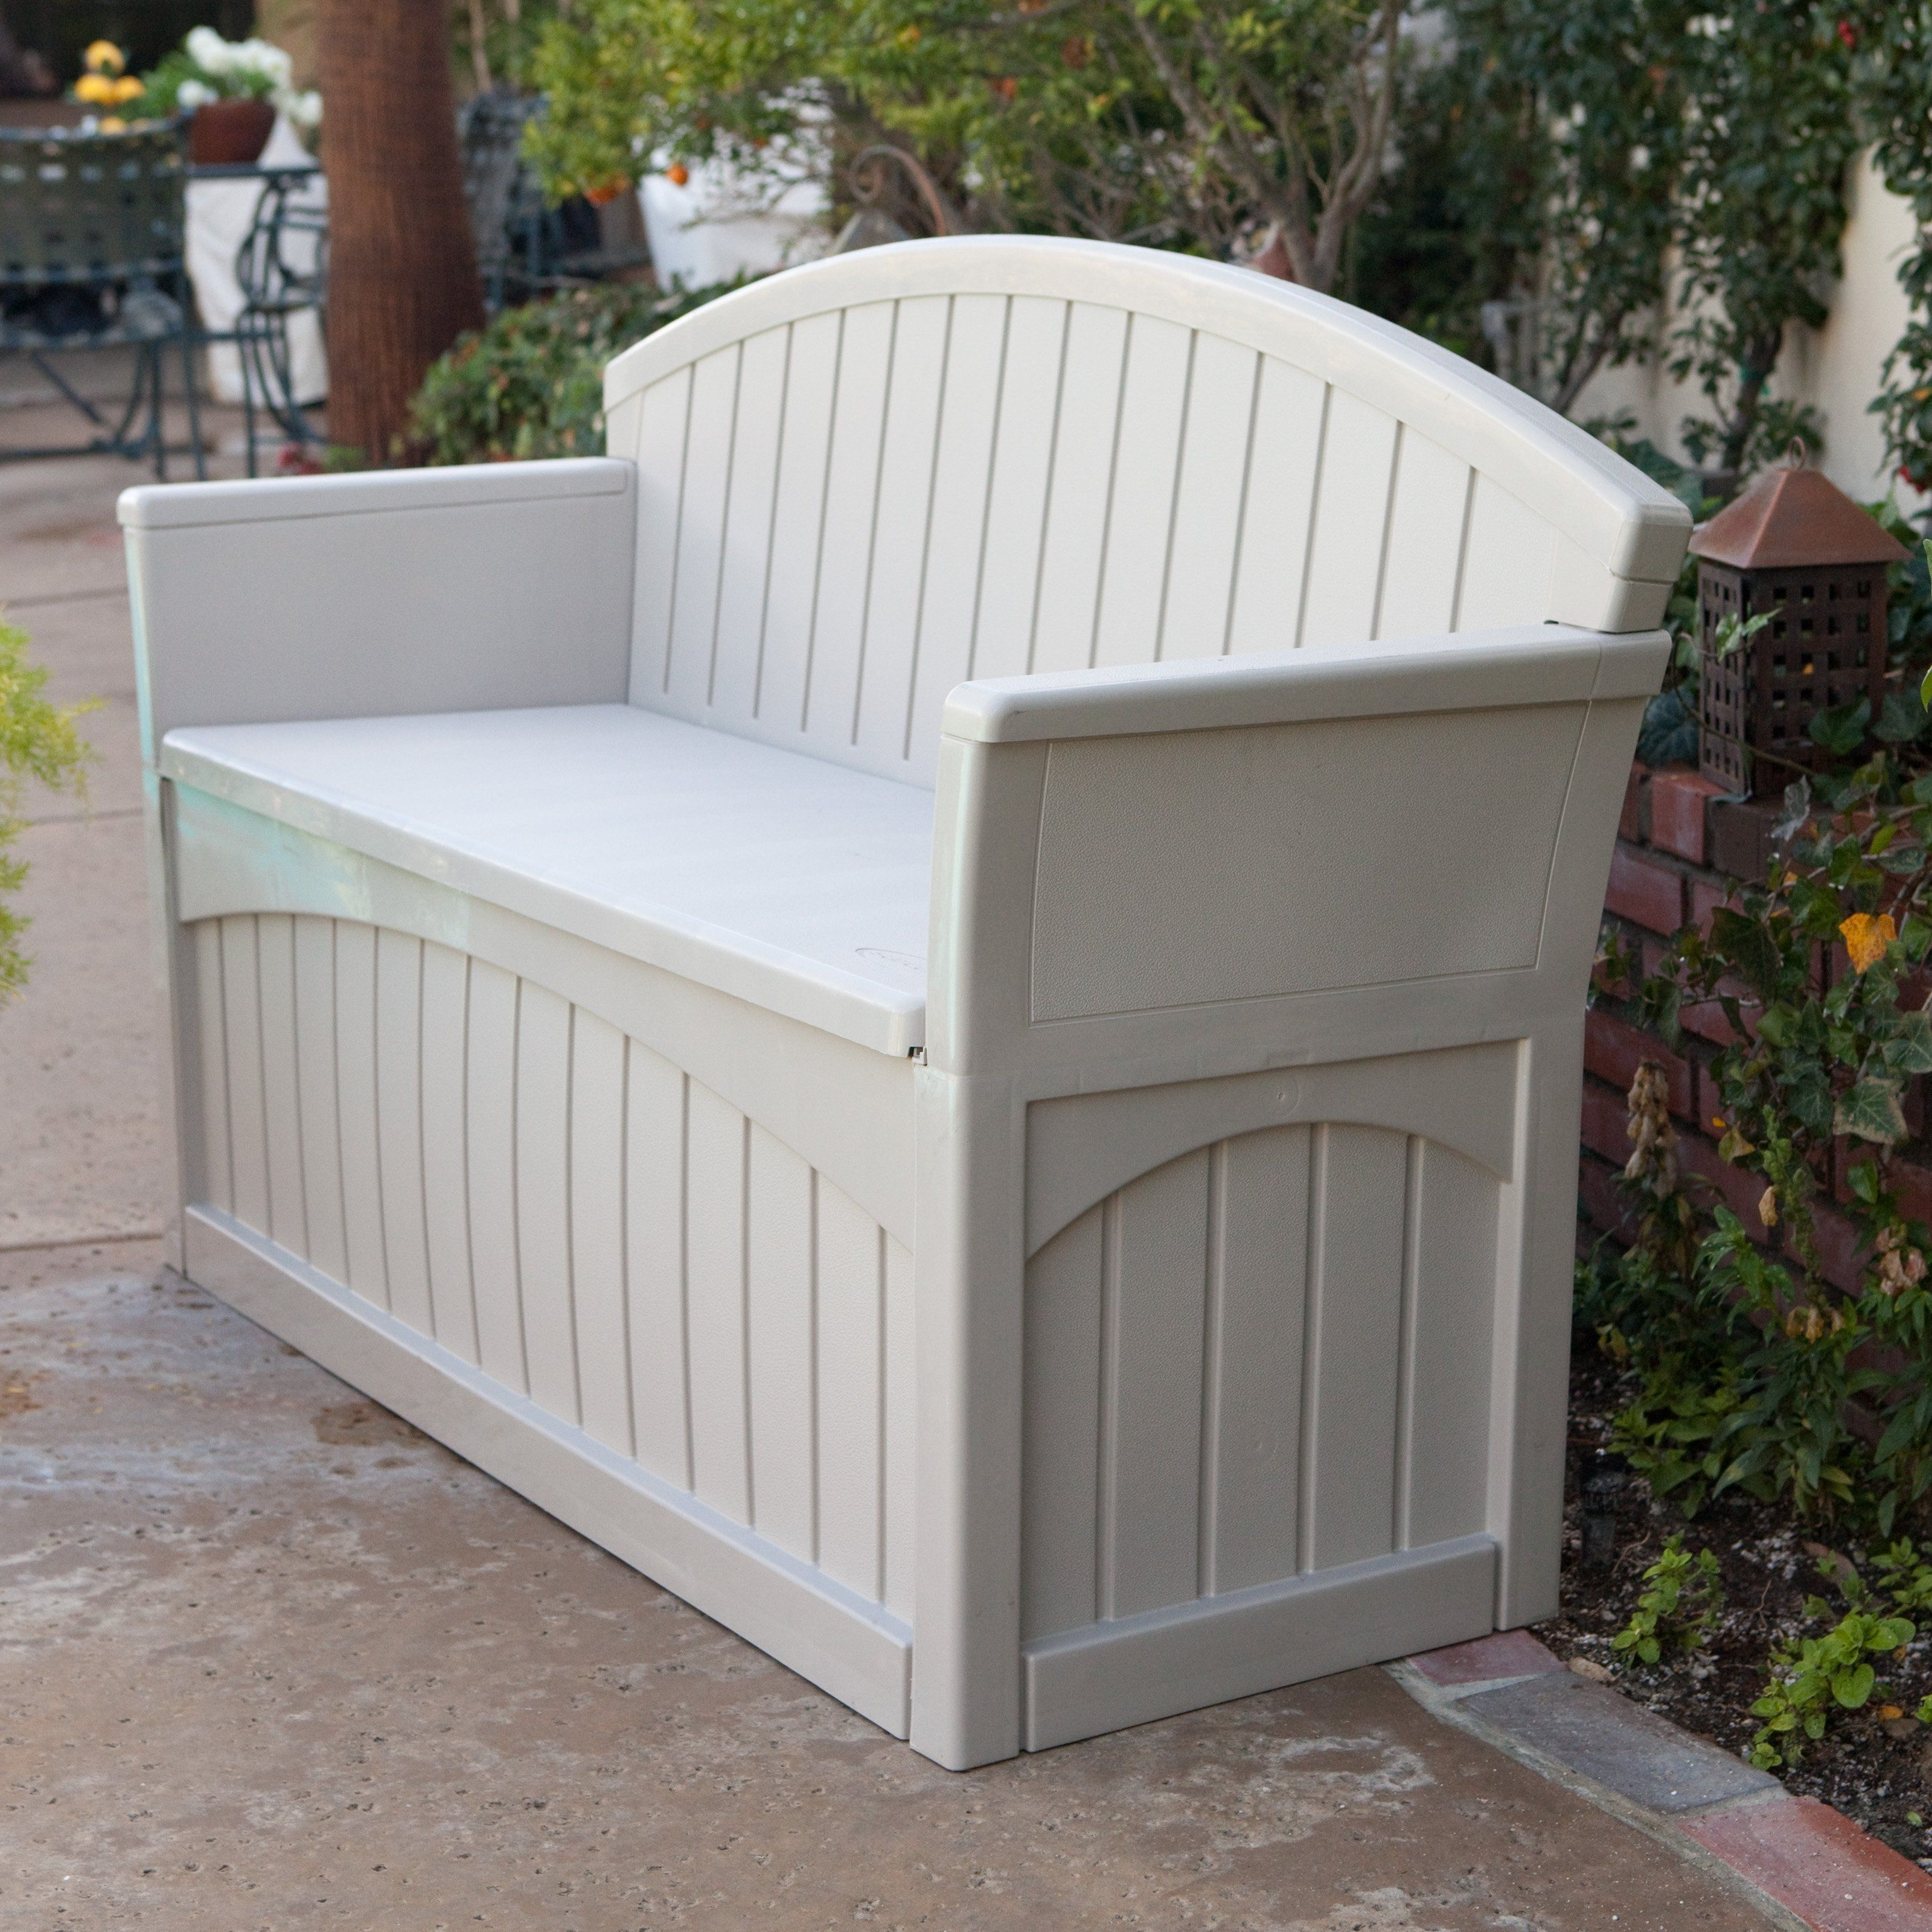 Suncast Pb6700 Ultimate 50 Gallon Resin Patio Storage Bench 116 98 Hayneedle